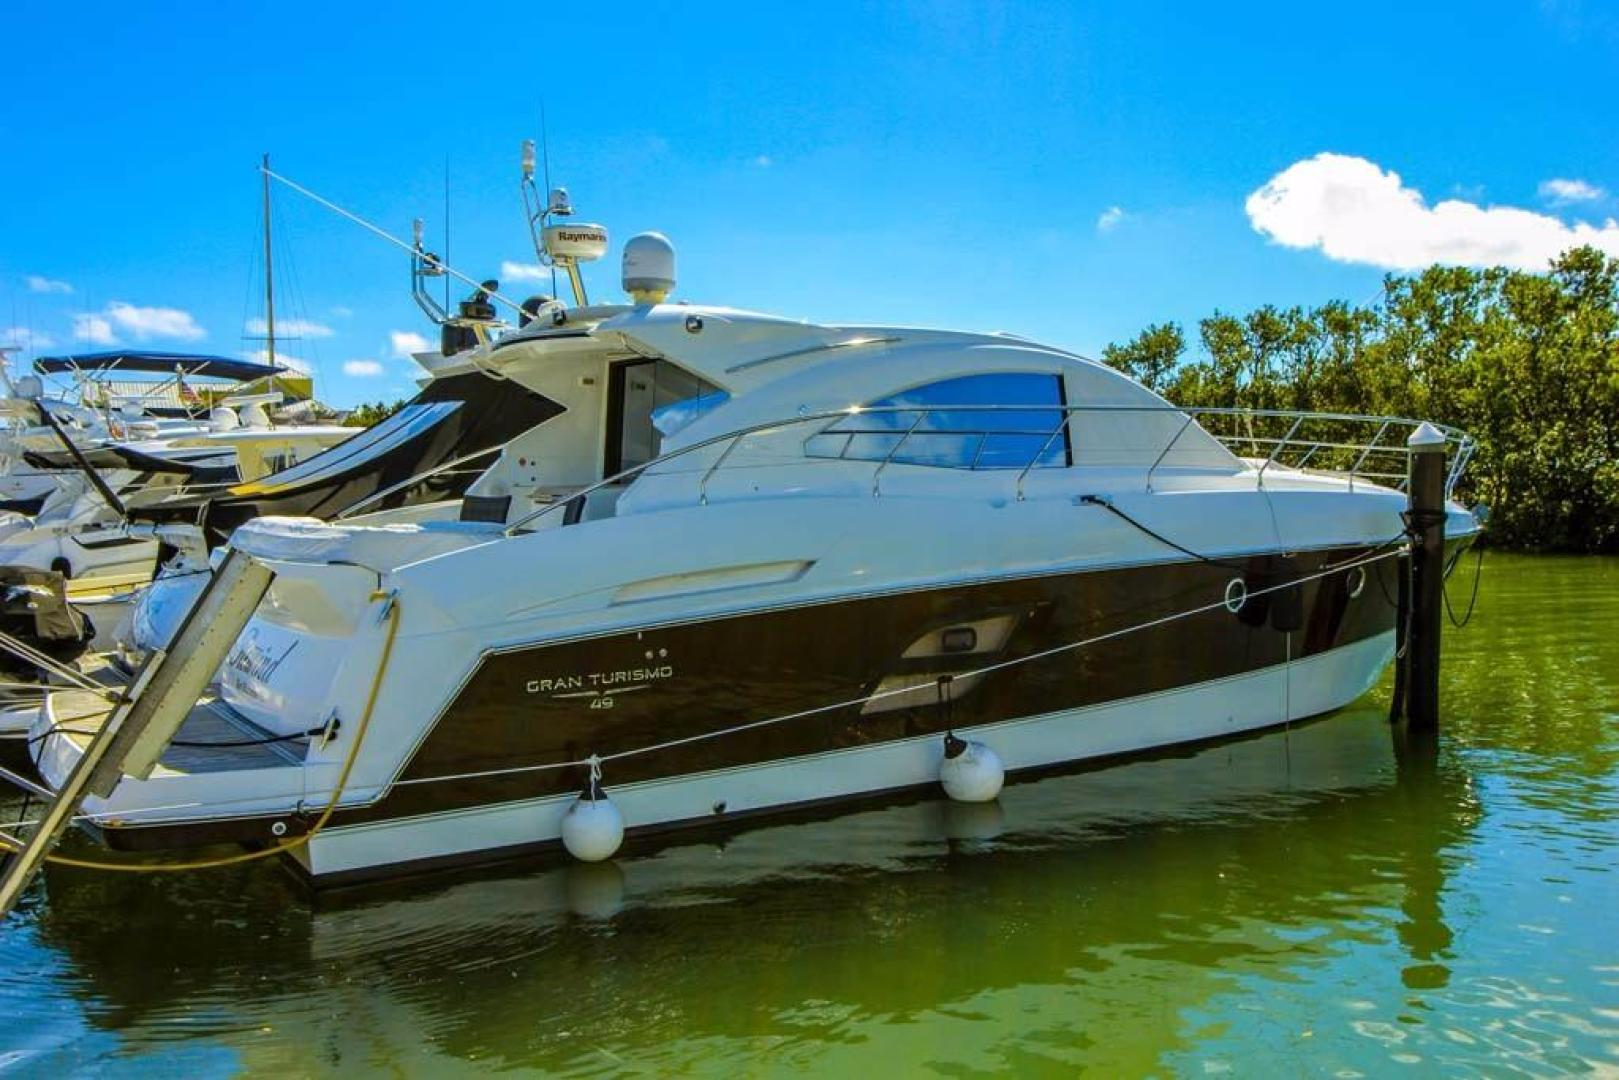 Beneteau-49 GT 2014 -Key Biscayne-Florida-United States-Profile-918794   Thumbnail